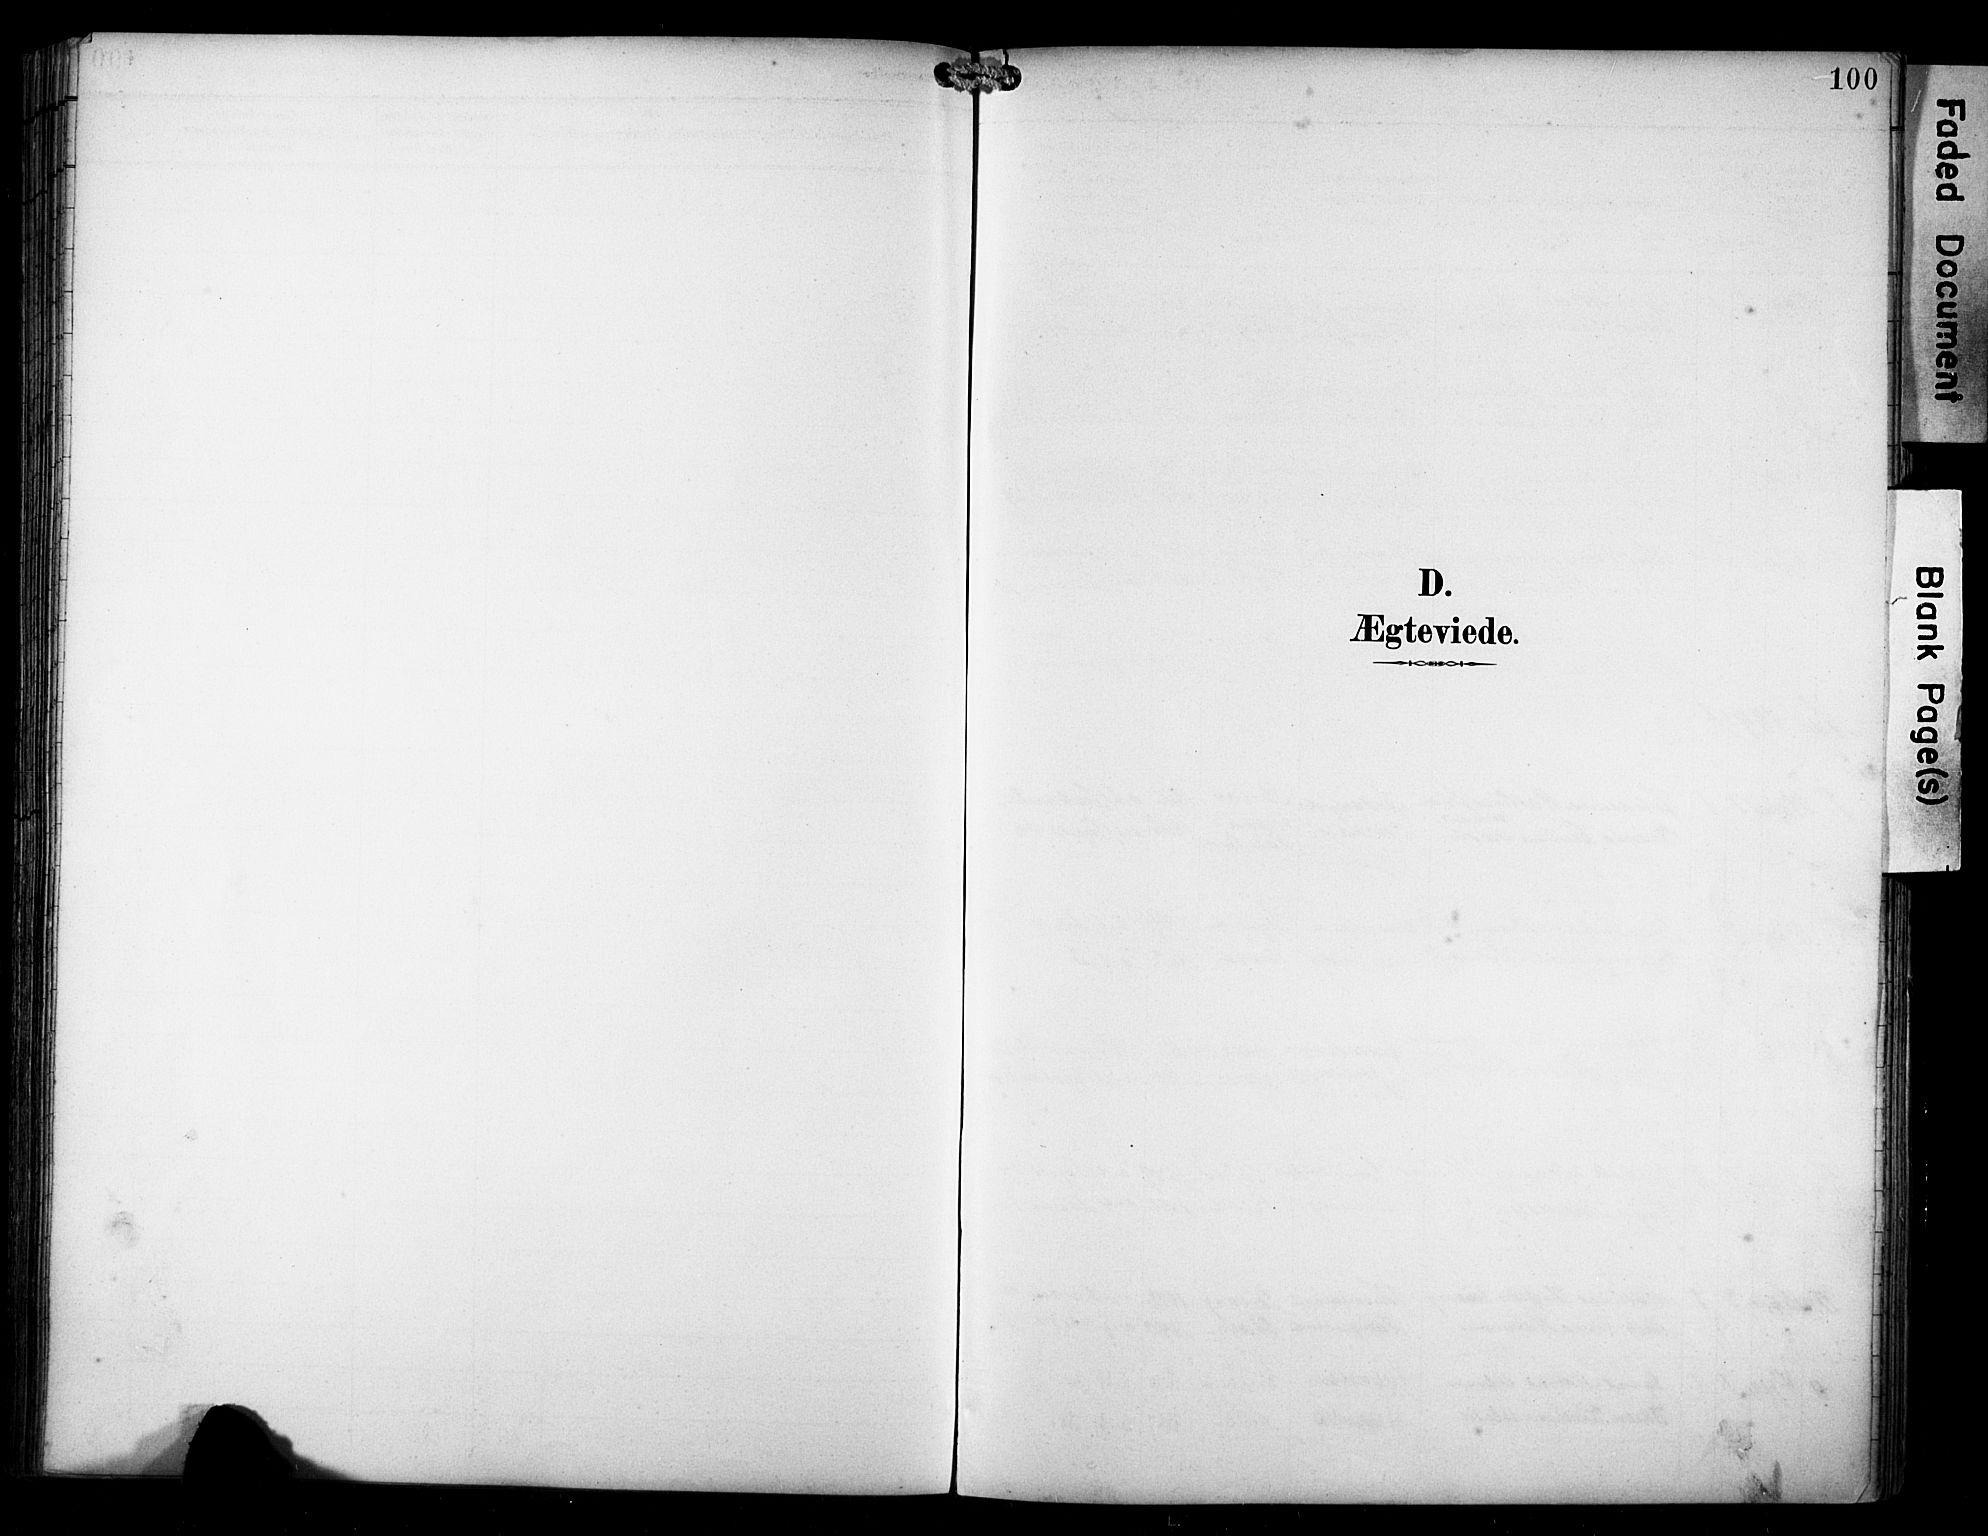 SAST, Avaldsnes sokneprestkontor, H/Ha/Haa/L0016: Ministerialbok nr. A 16, 1893-1918, s. 100